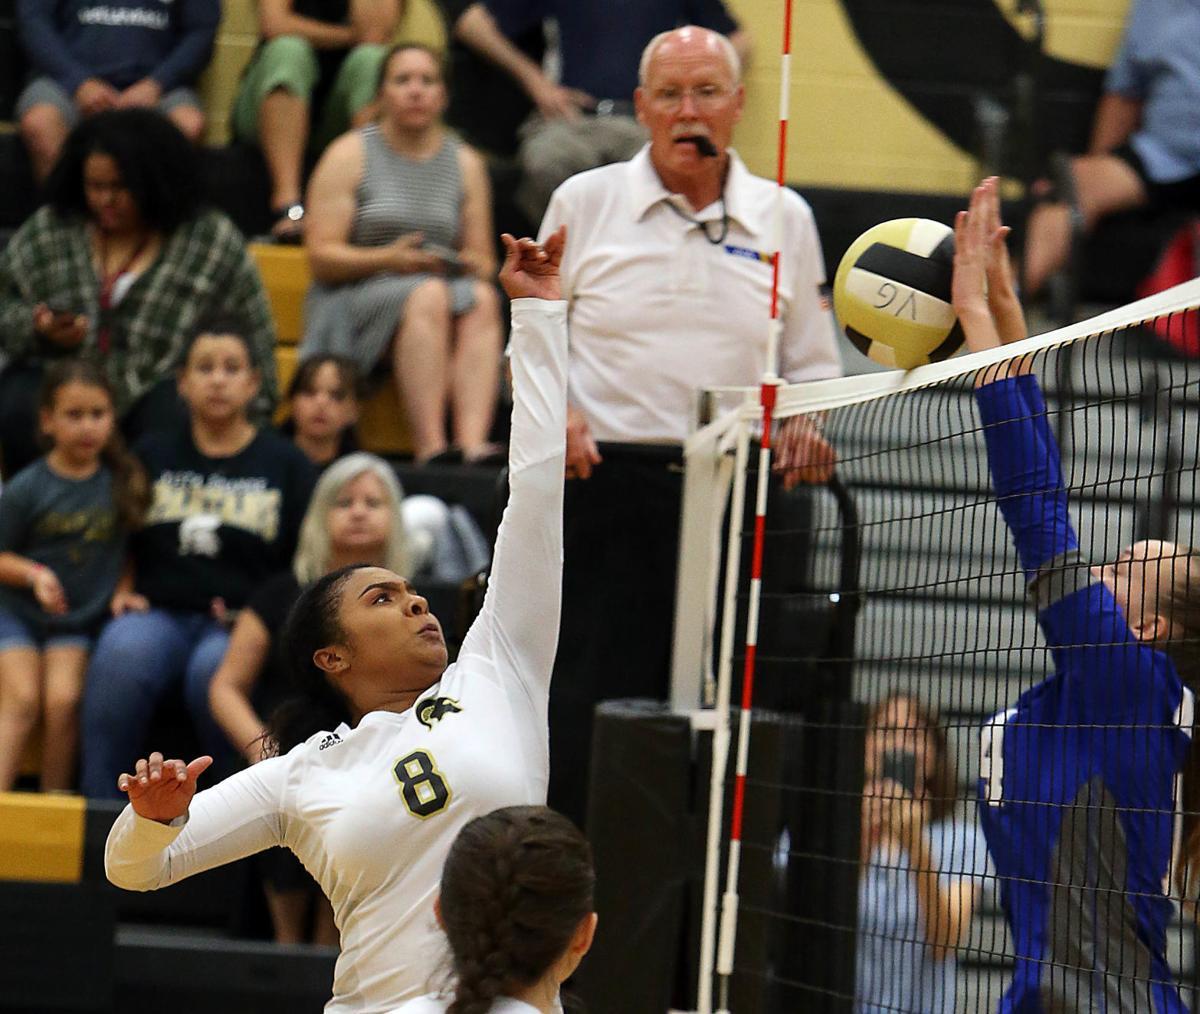 Vista Grande vs. Mequite volleyball 9/5/19